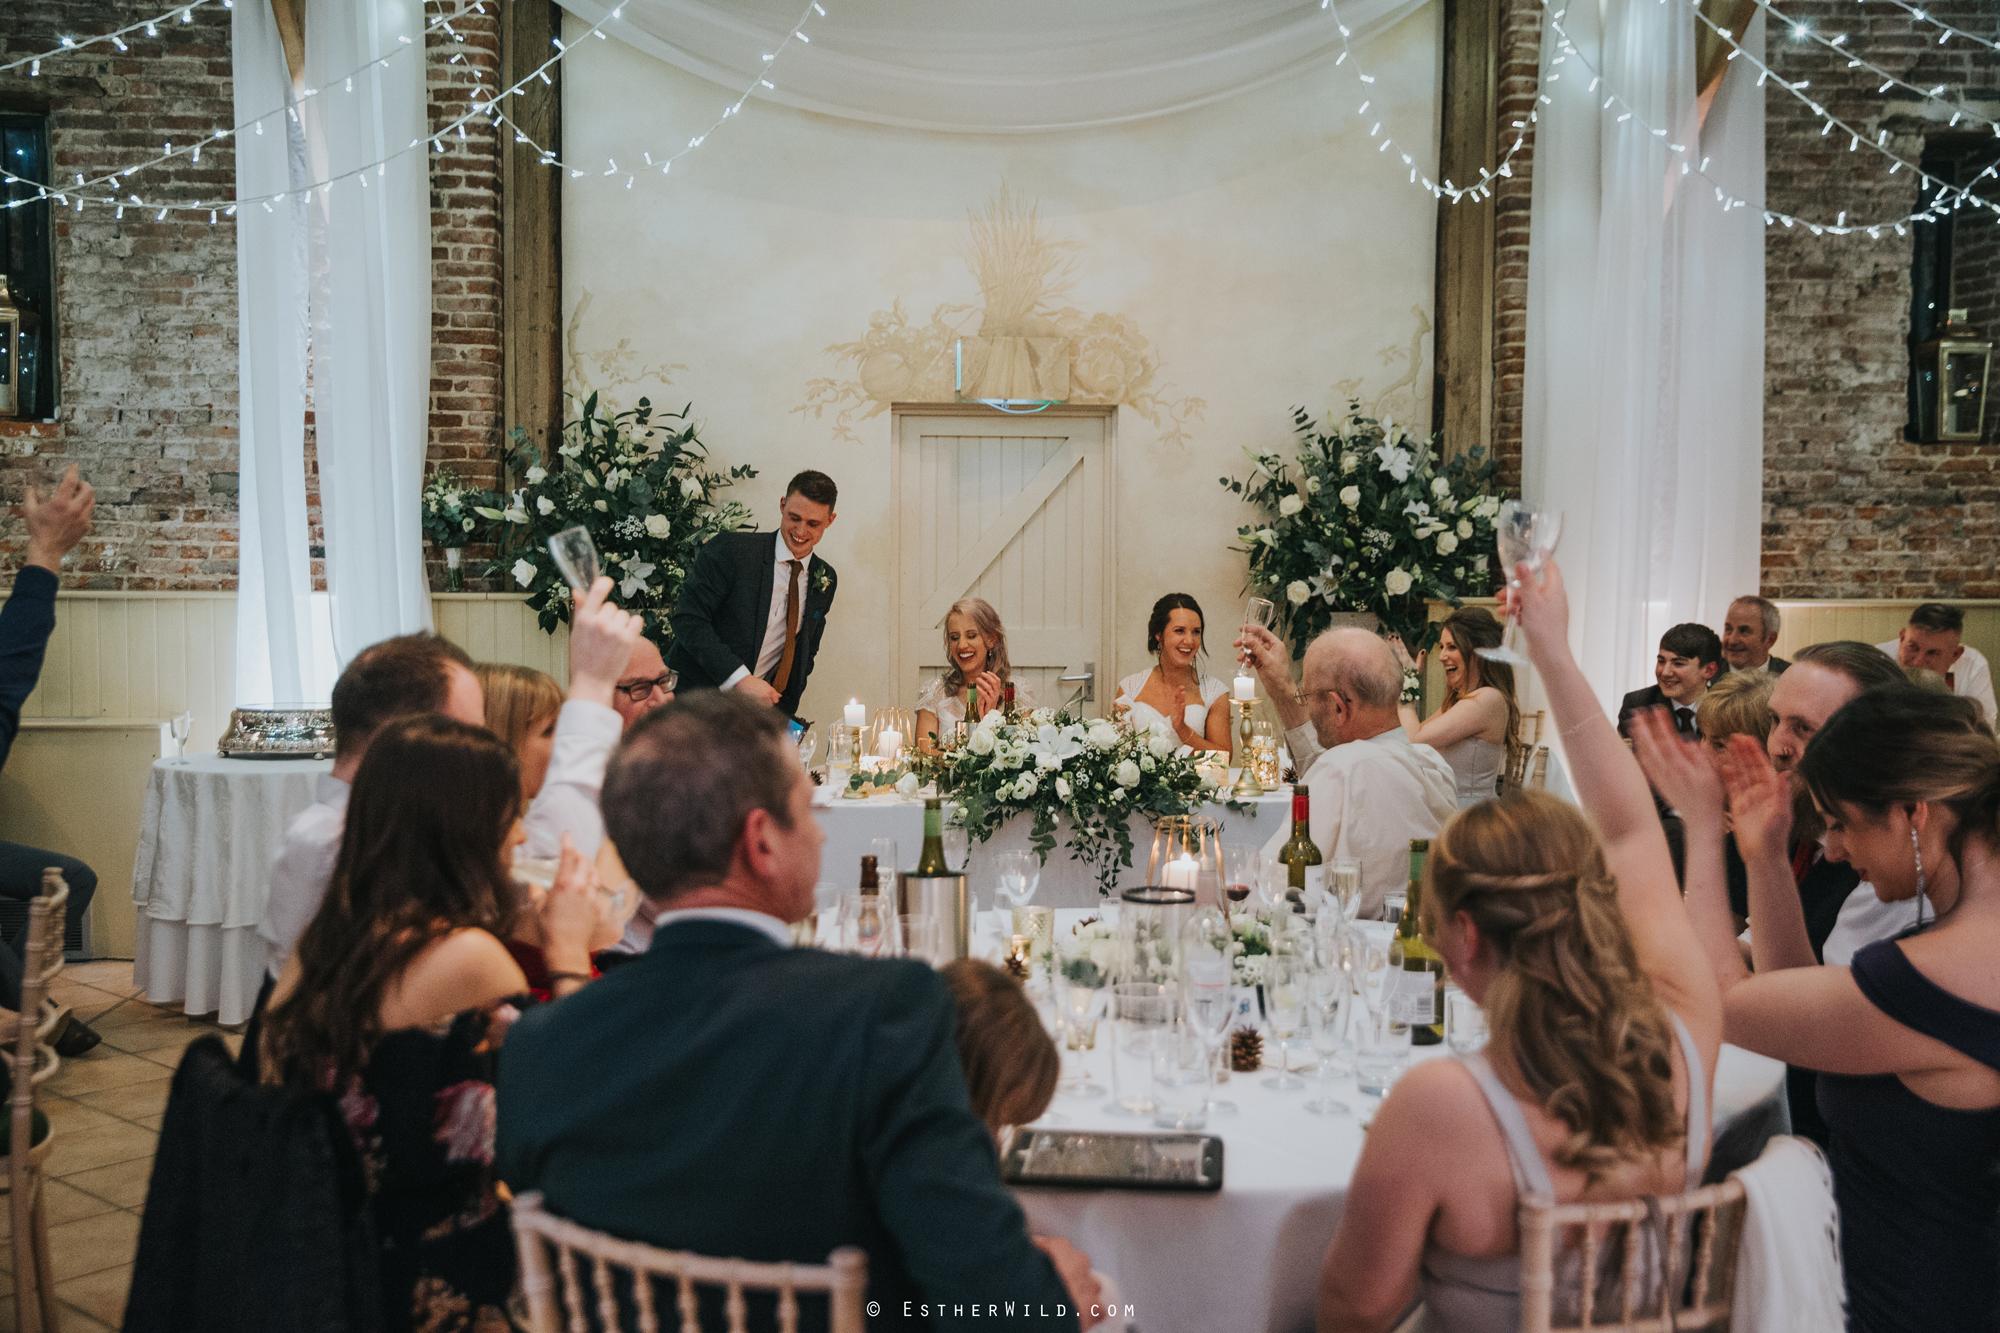 Elms_Barn_Weddings_Suffolk_Photographer_Copyright_Esther_Wild_IMG_2961.jpg